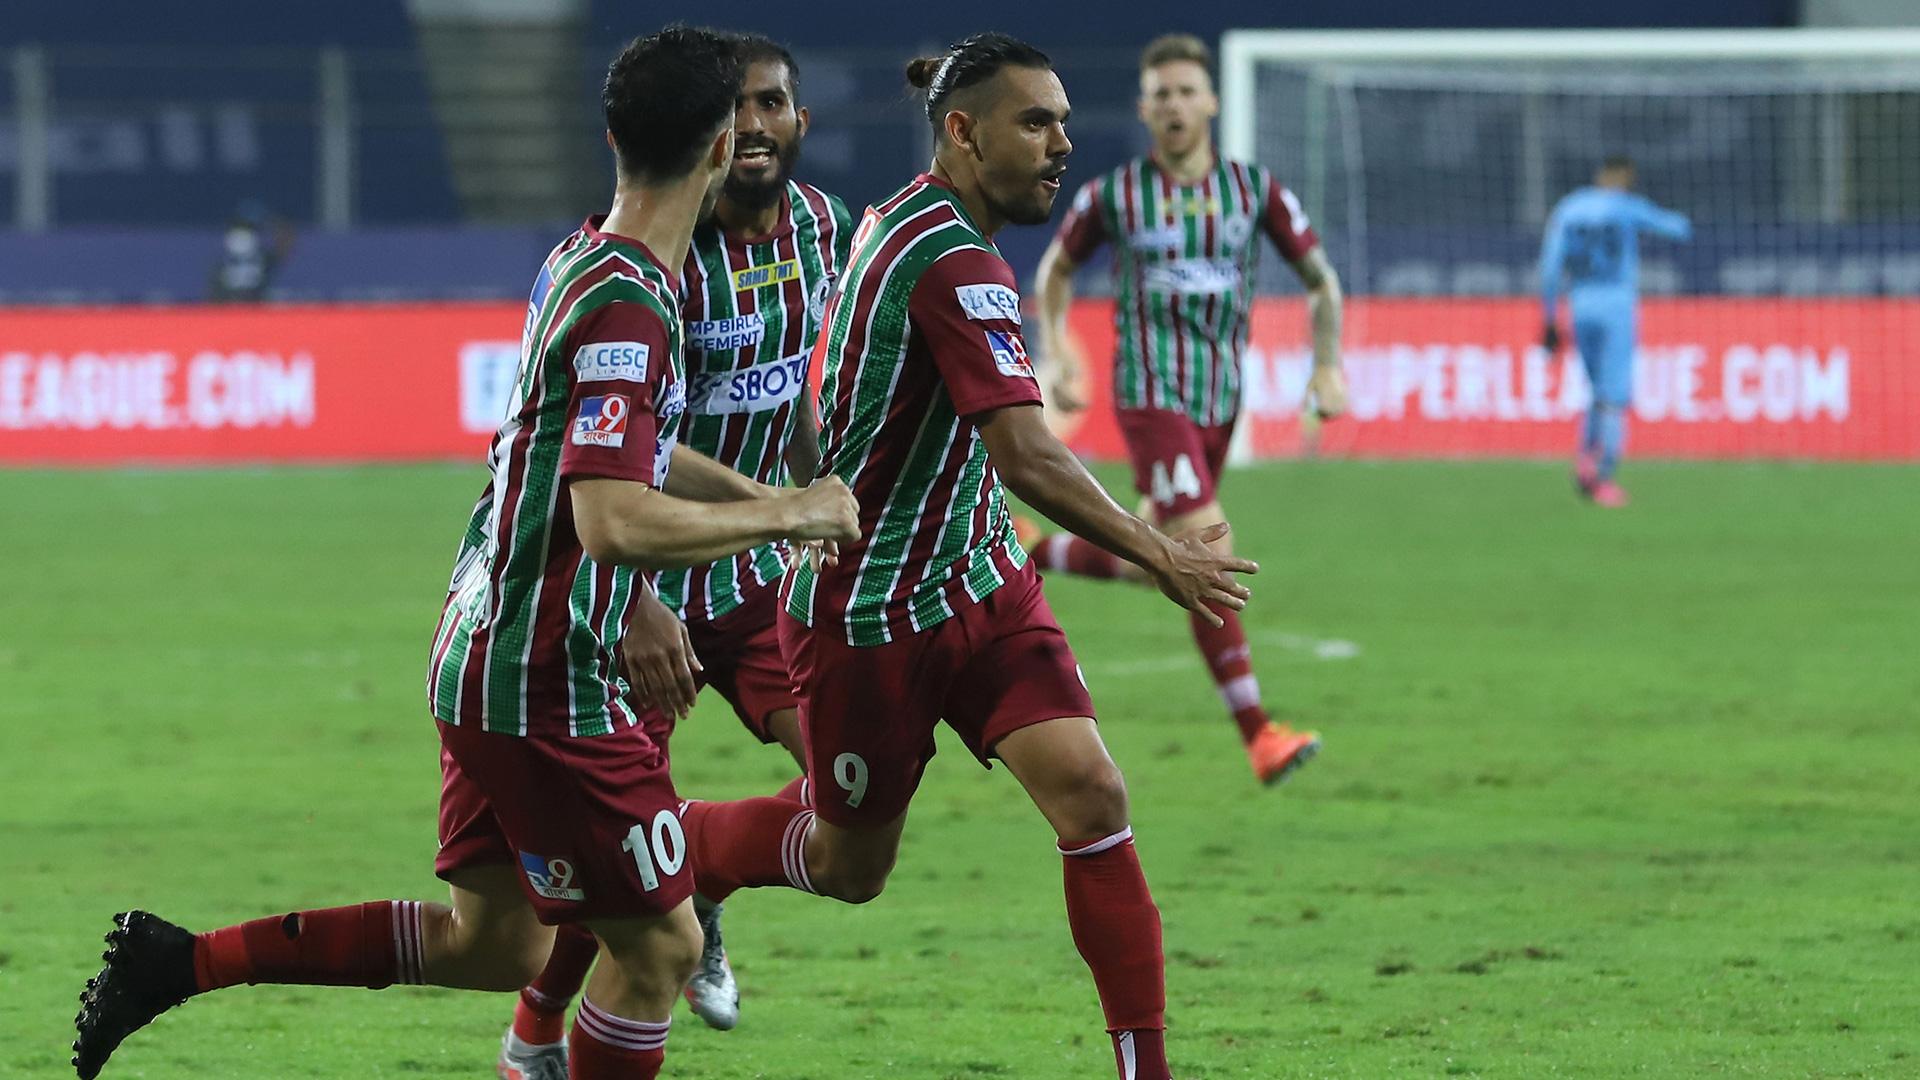 ATK Mohun Bagan 1-0 Bengaluru: David Williams stunner ends Blues' unbeaten run